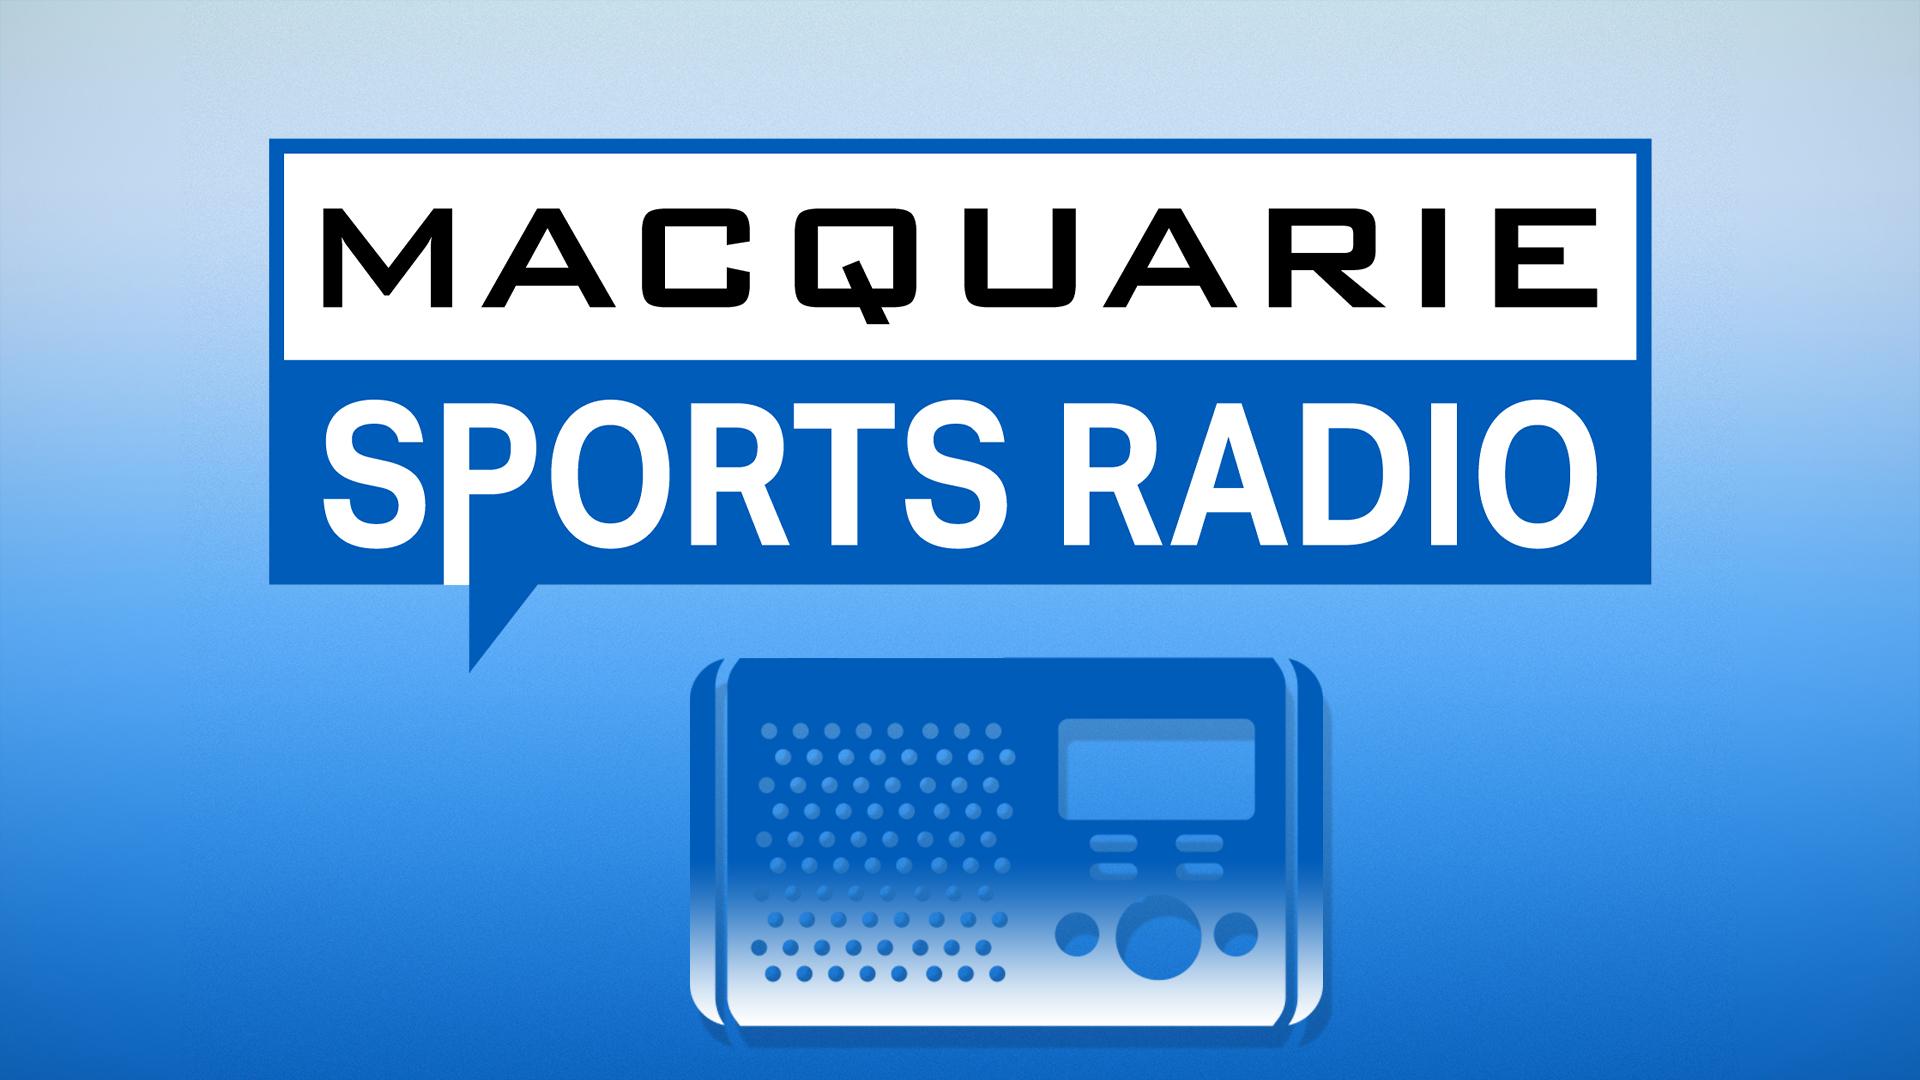 Macquarie Sports Radio 954